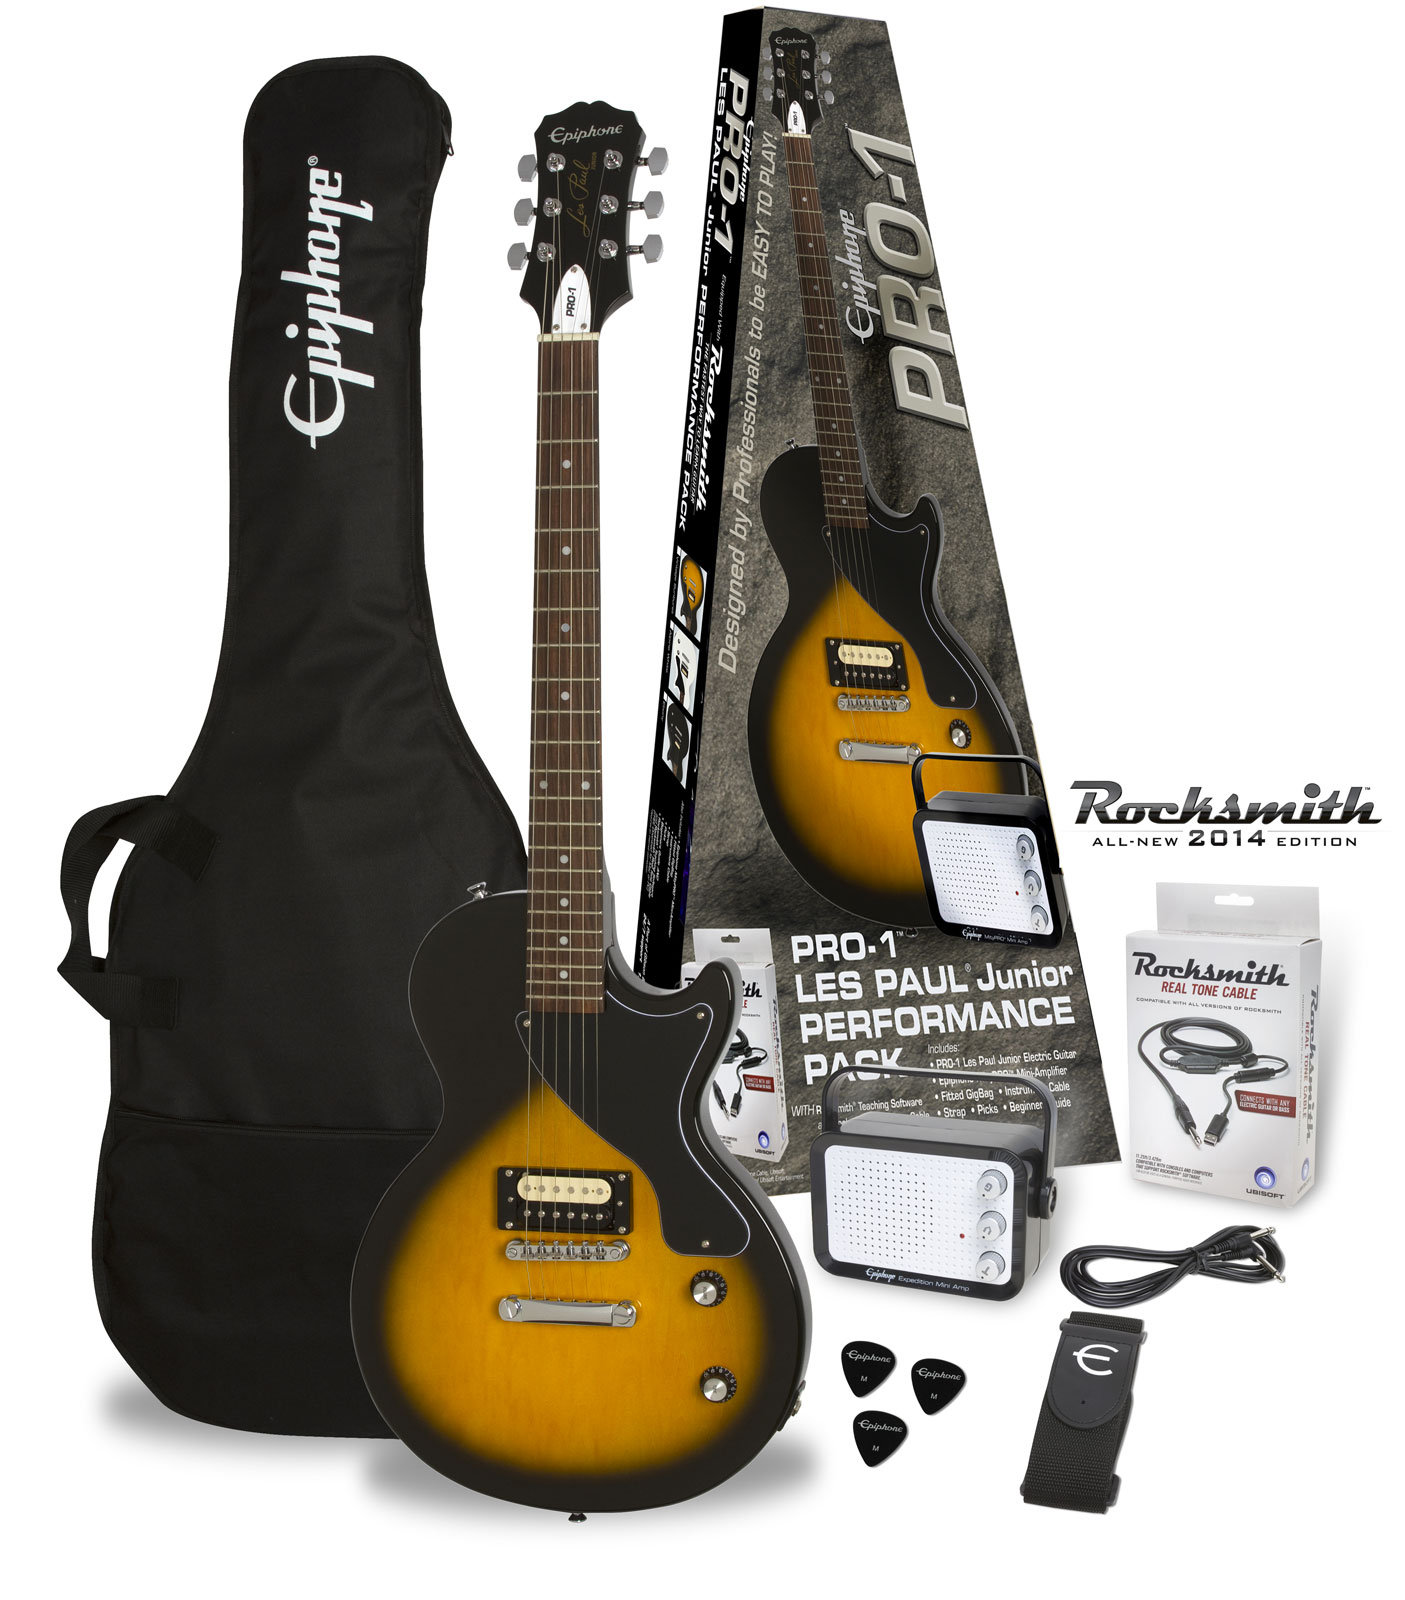 Epiphone Pro-1 Les Paul Junior Vintage Sunburst Pack (rocksmith)